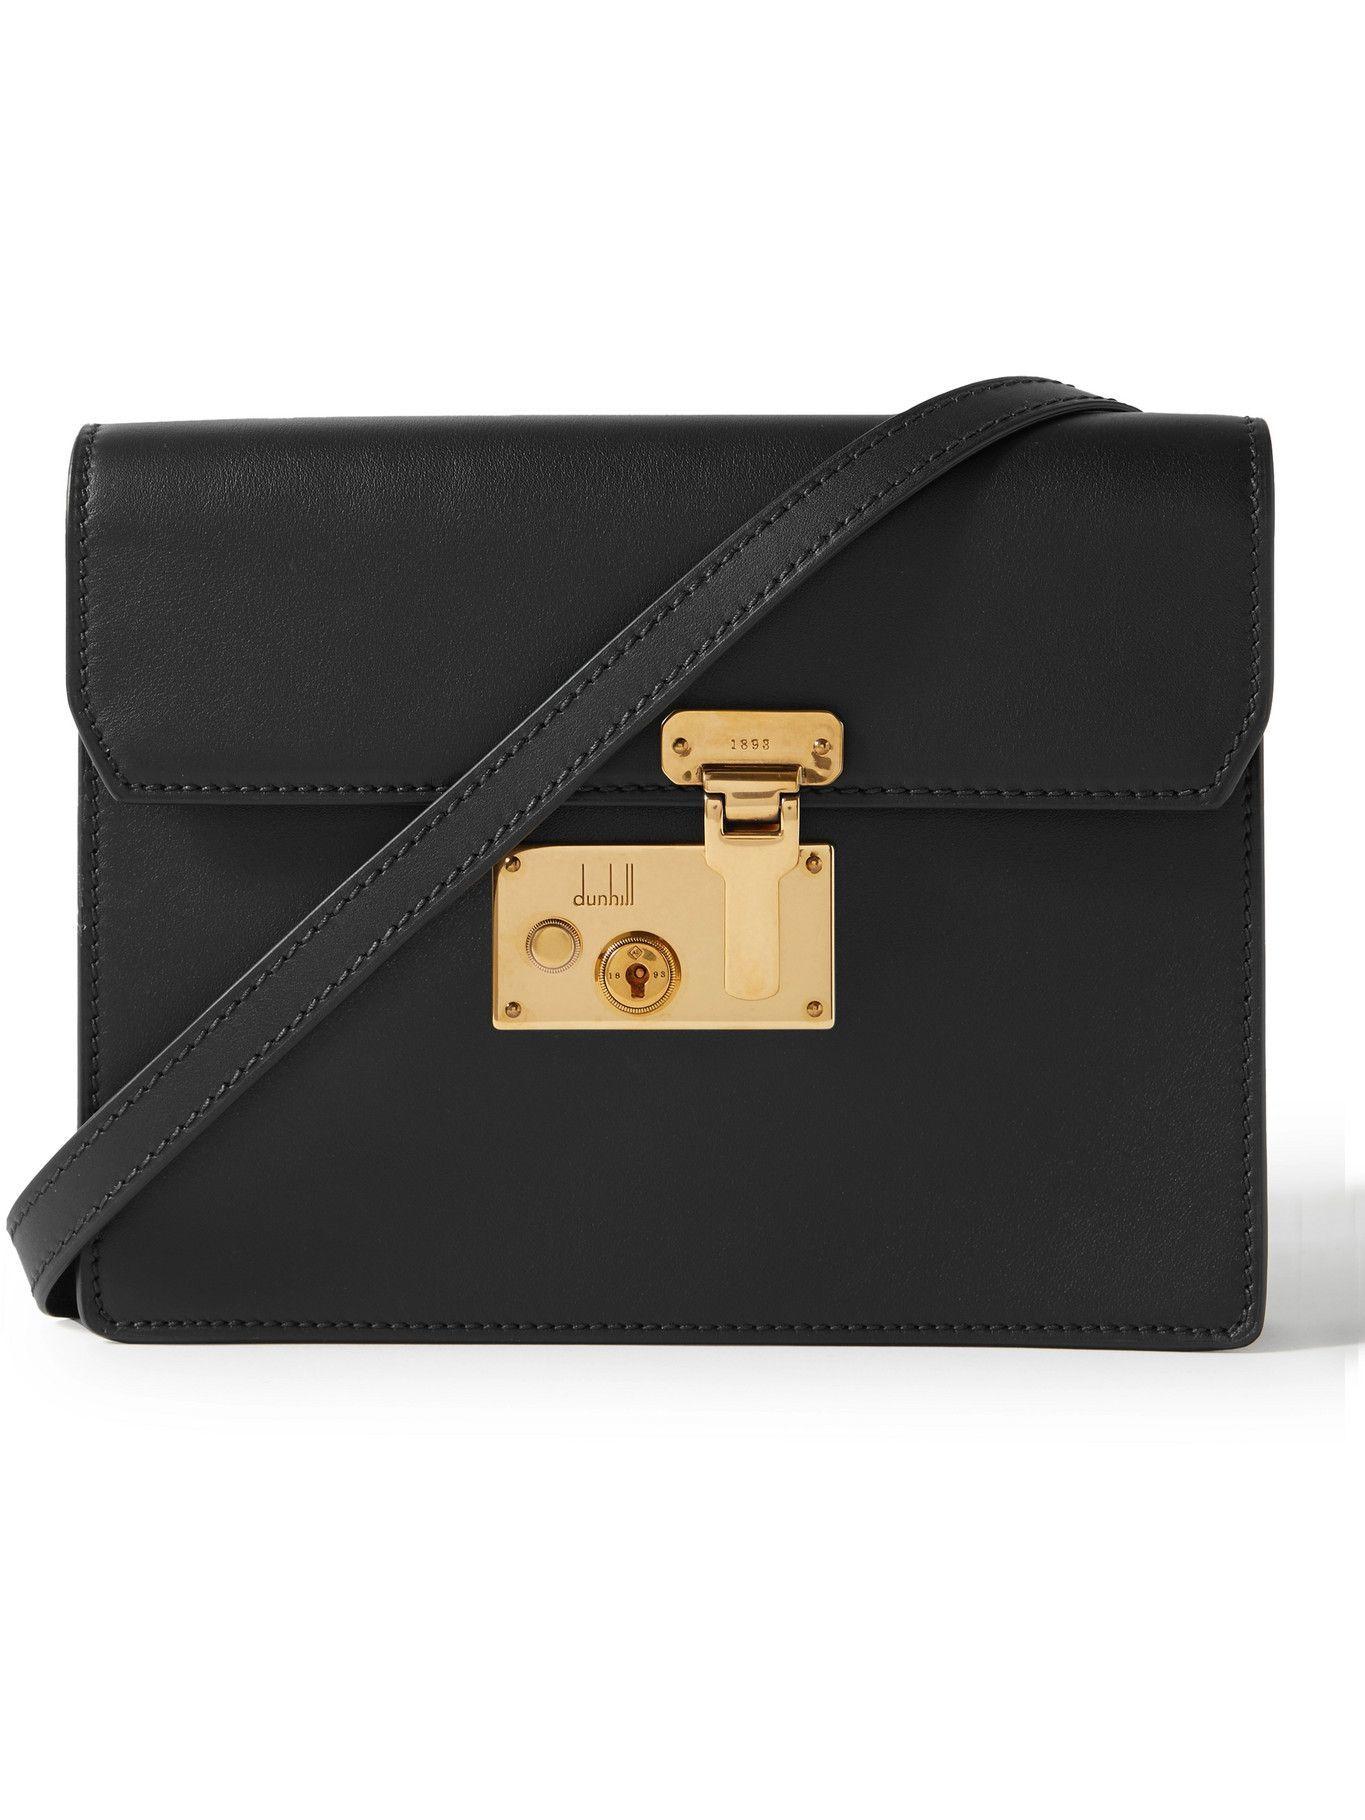 Dunhill - Lock Leather Messenger Bag